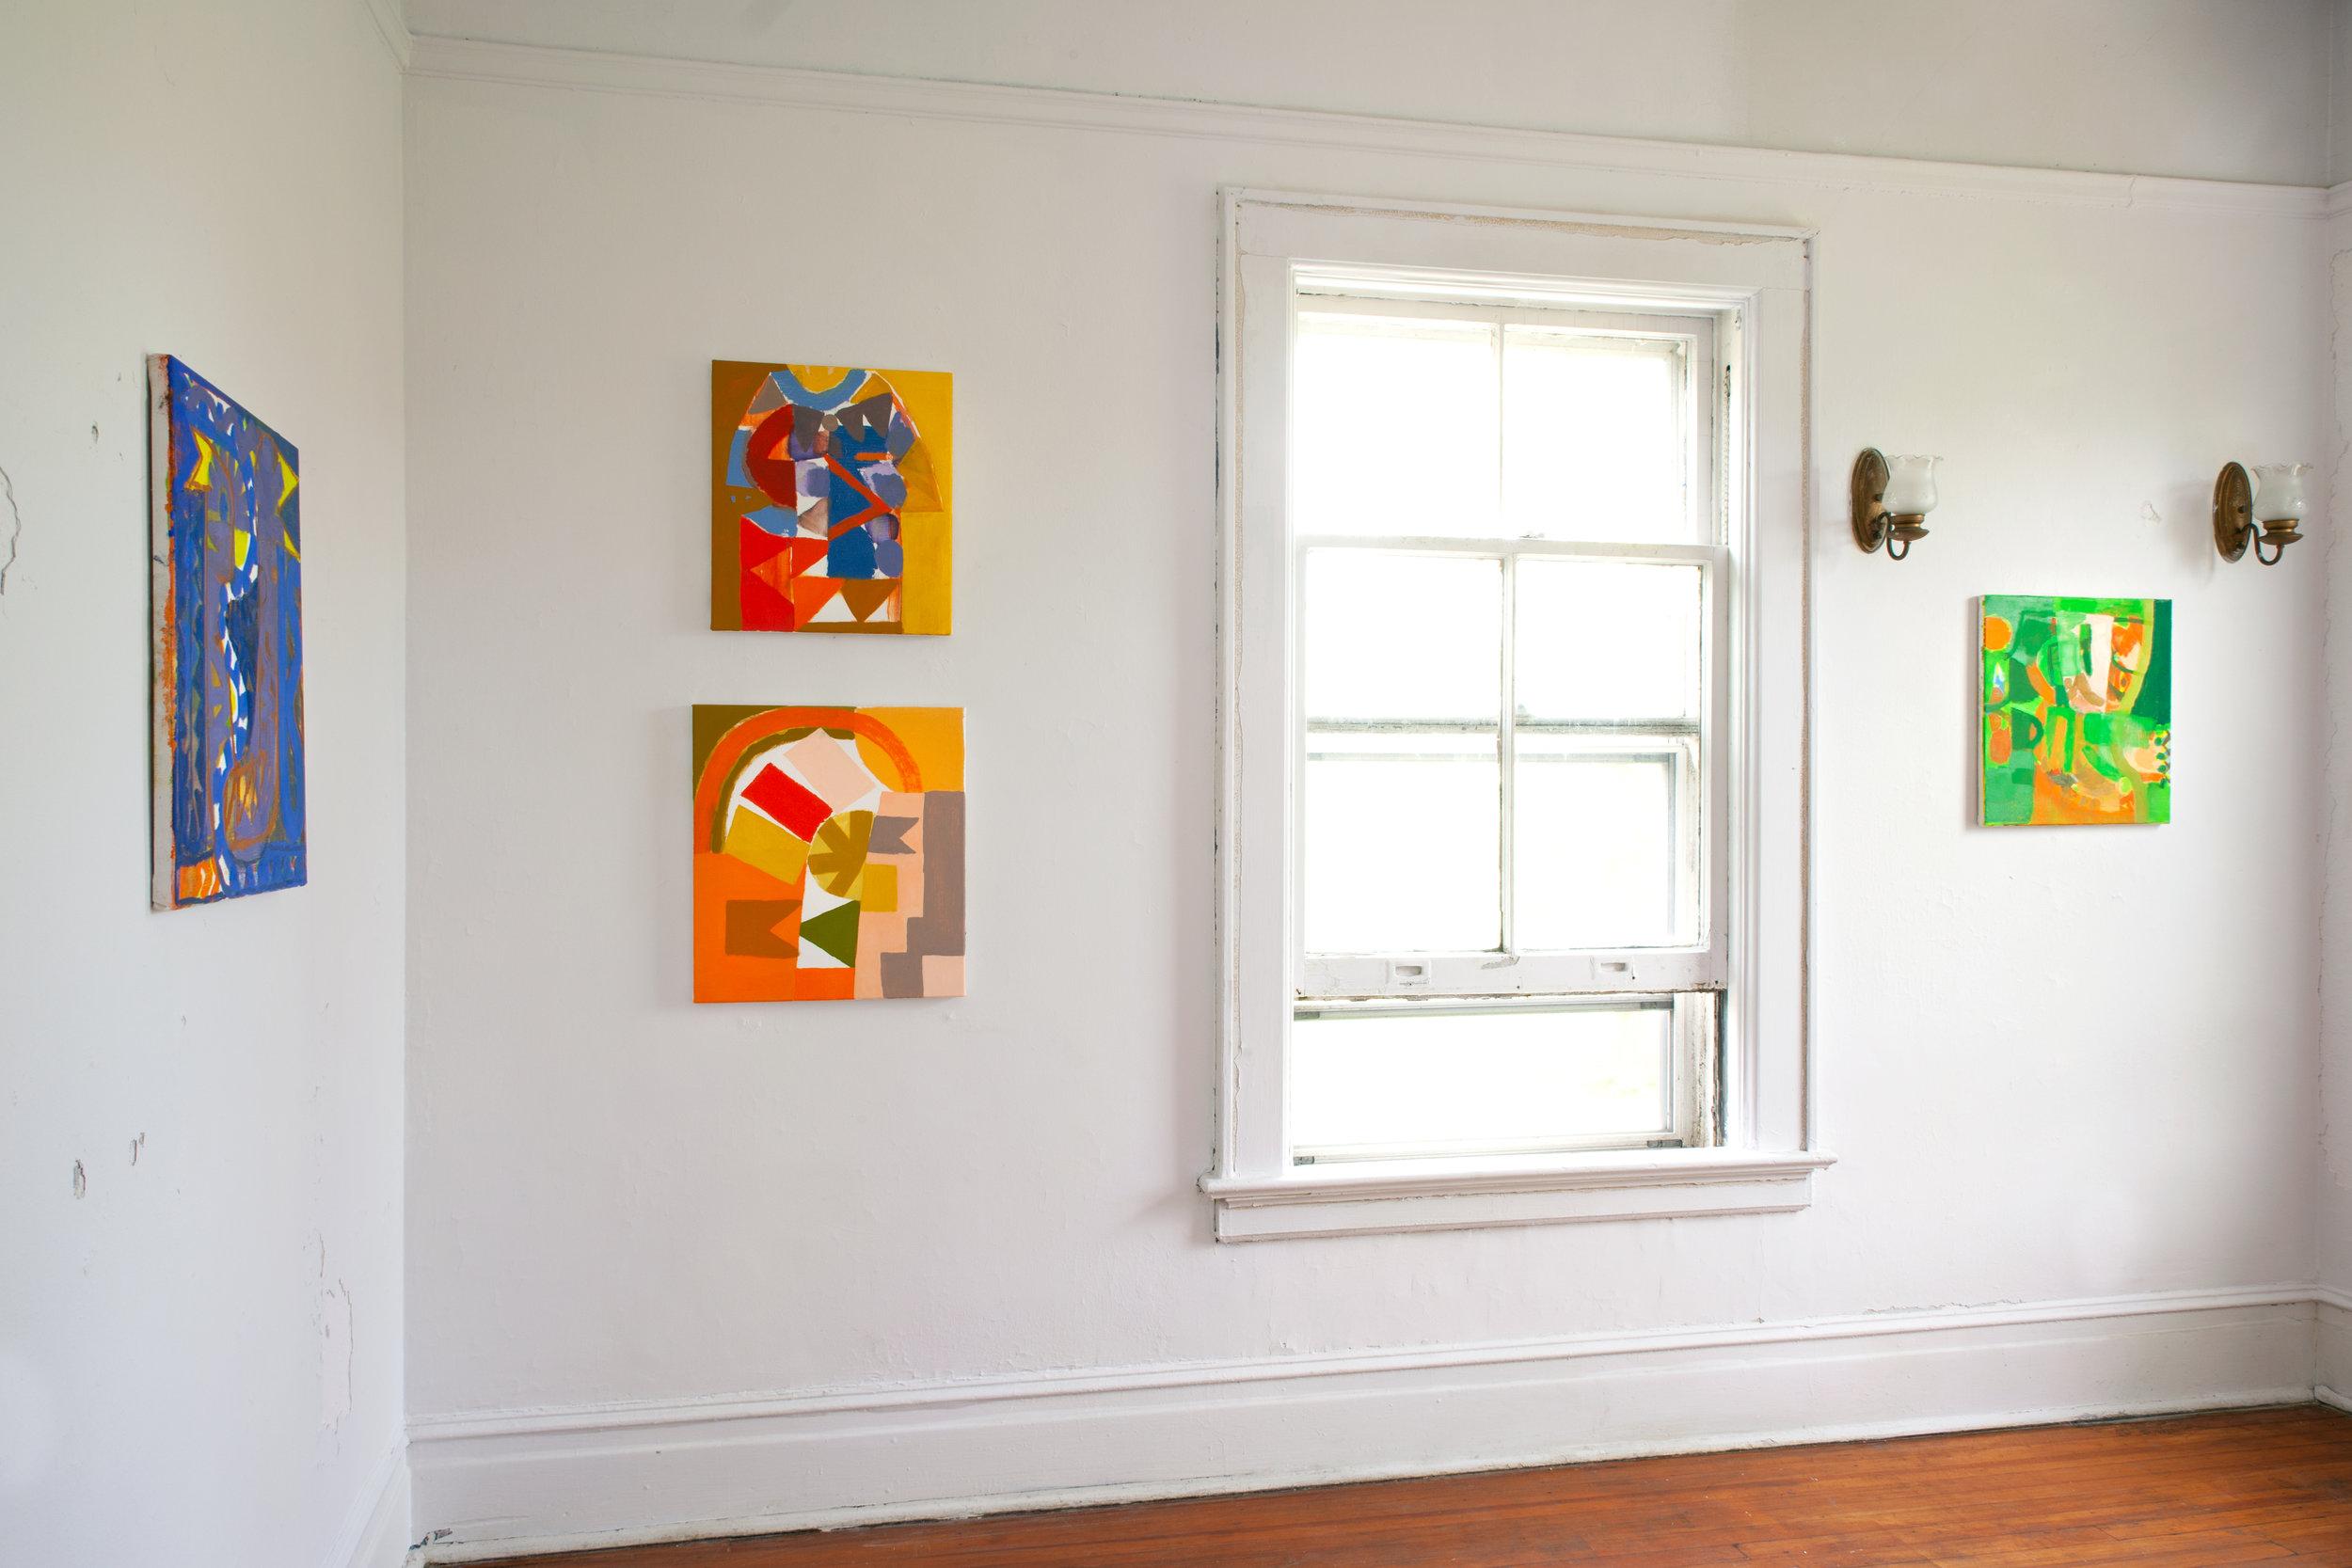 Meghan_Brady-NADA_House-2019-installation_view_01.jpg